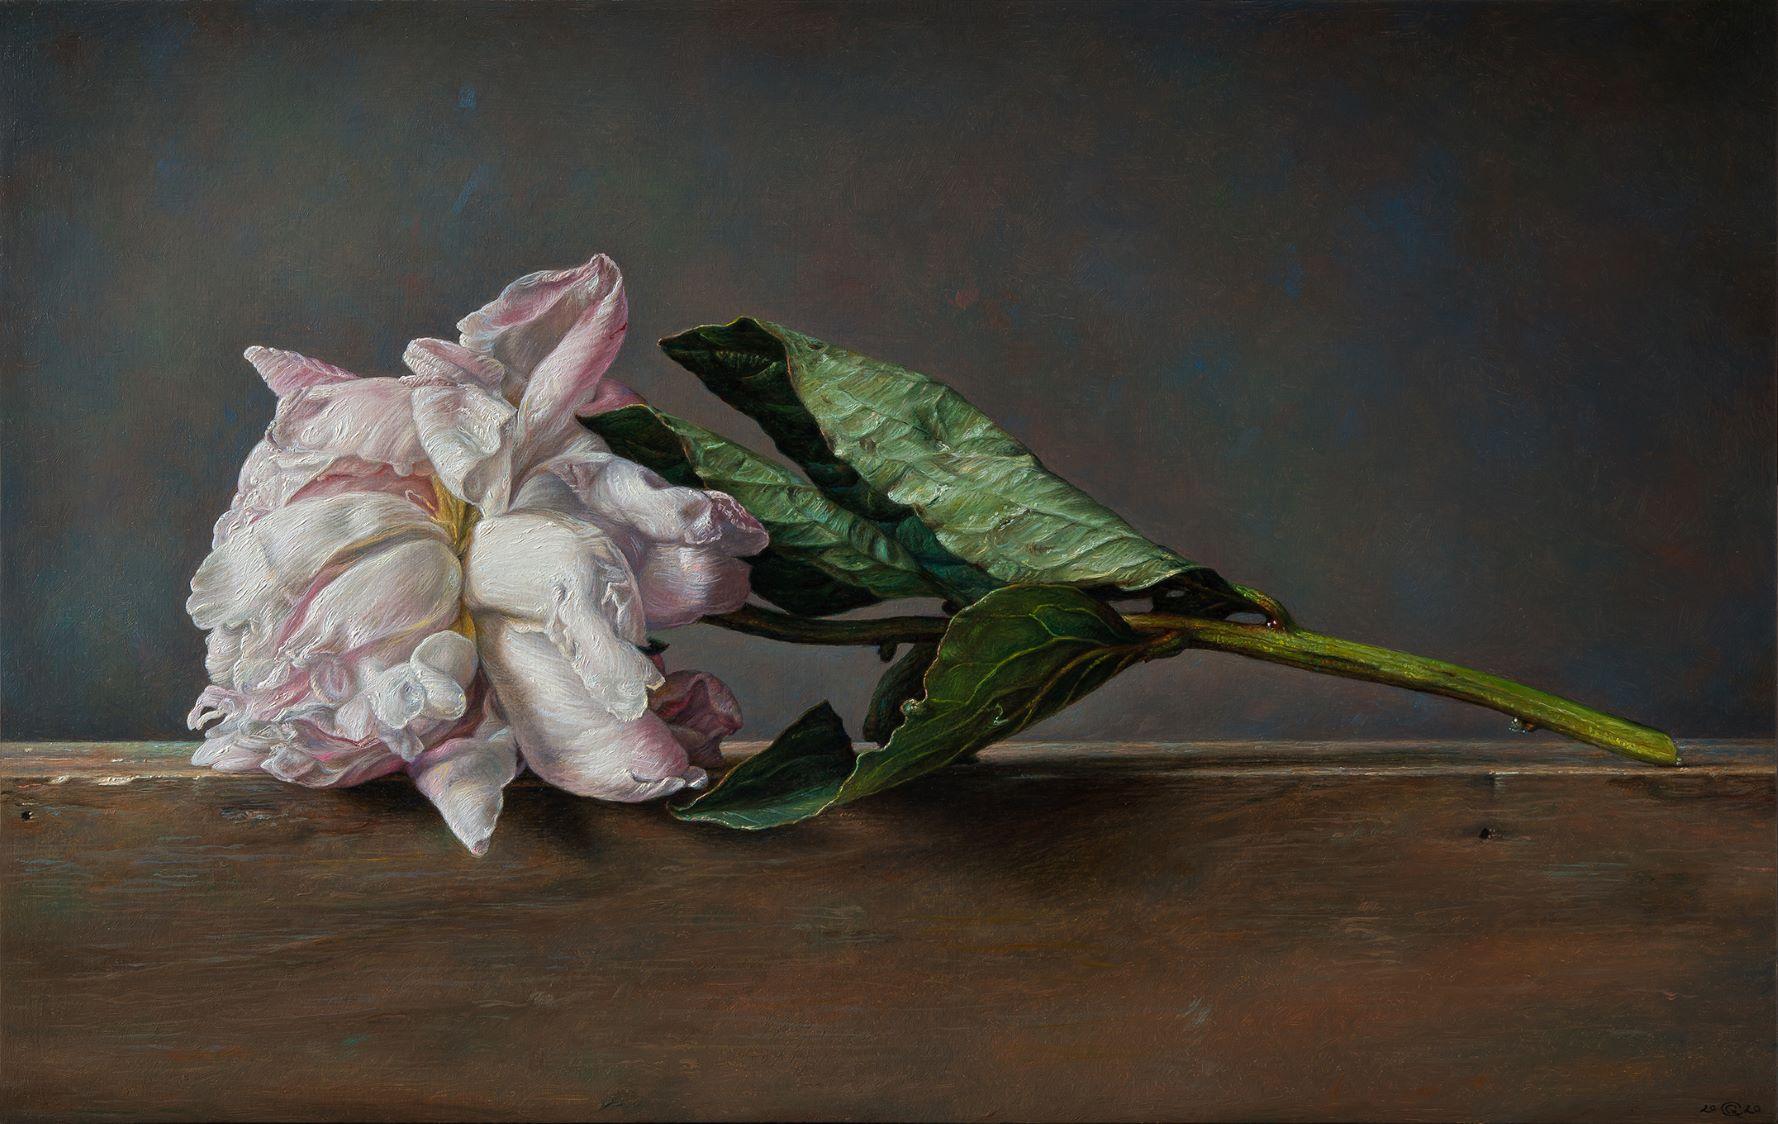 Sleeping Beauty - 2020 olio su tavola cm 32x50,5 © Gianluca Corona